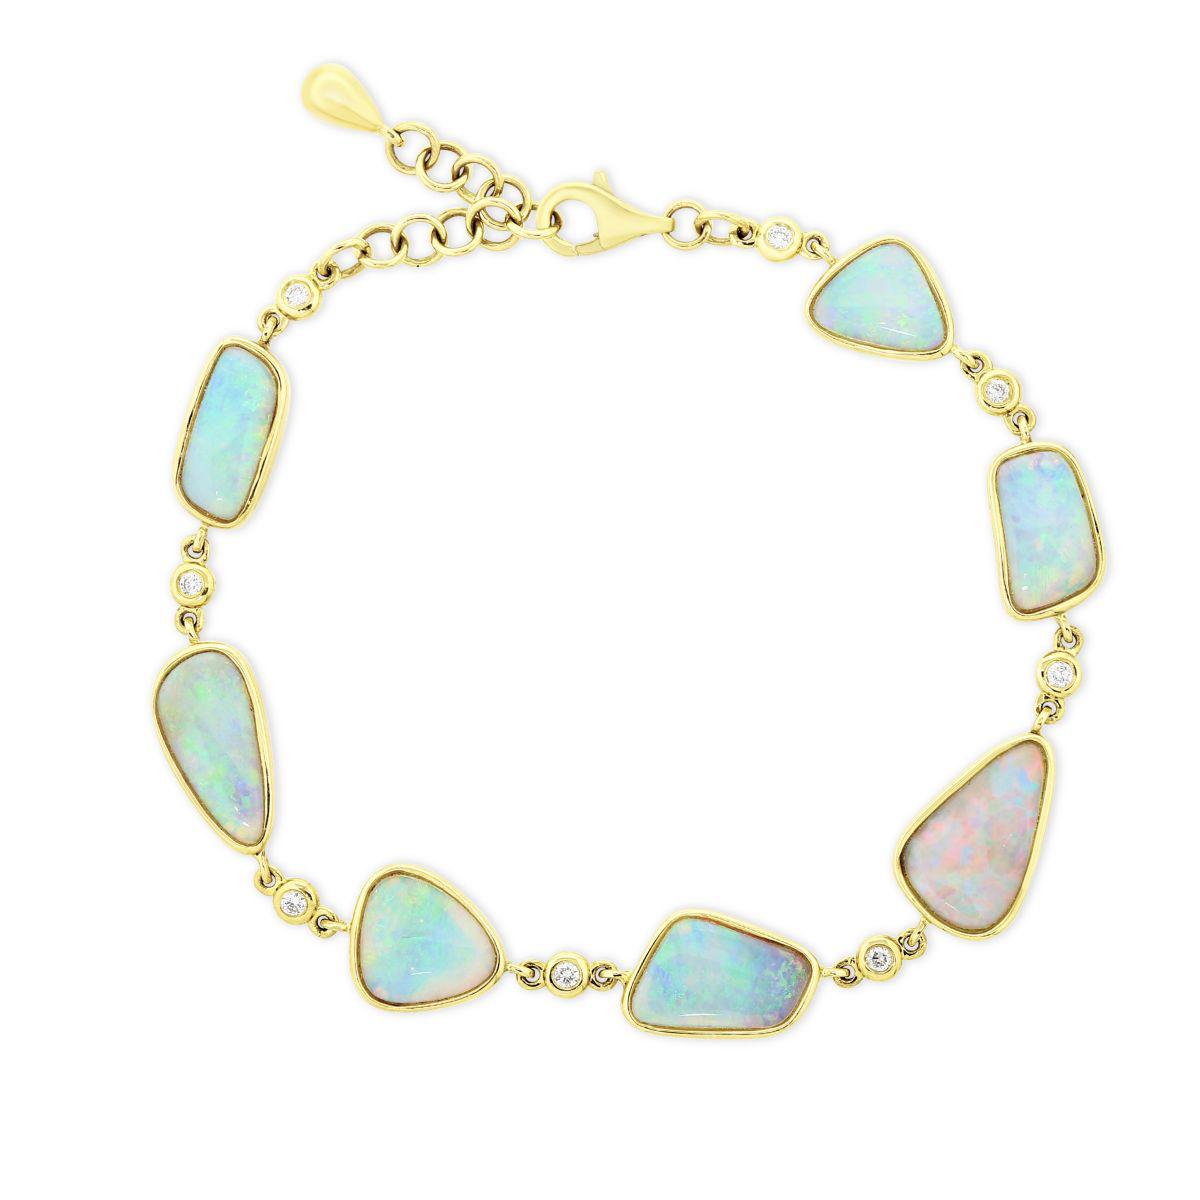 Opal Jewelry October Birthstone Jewelry Borsheims